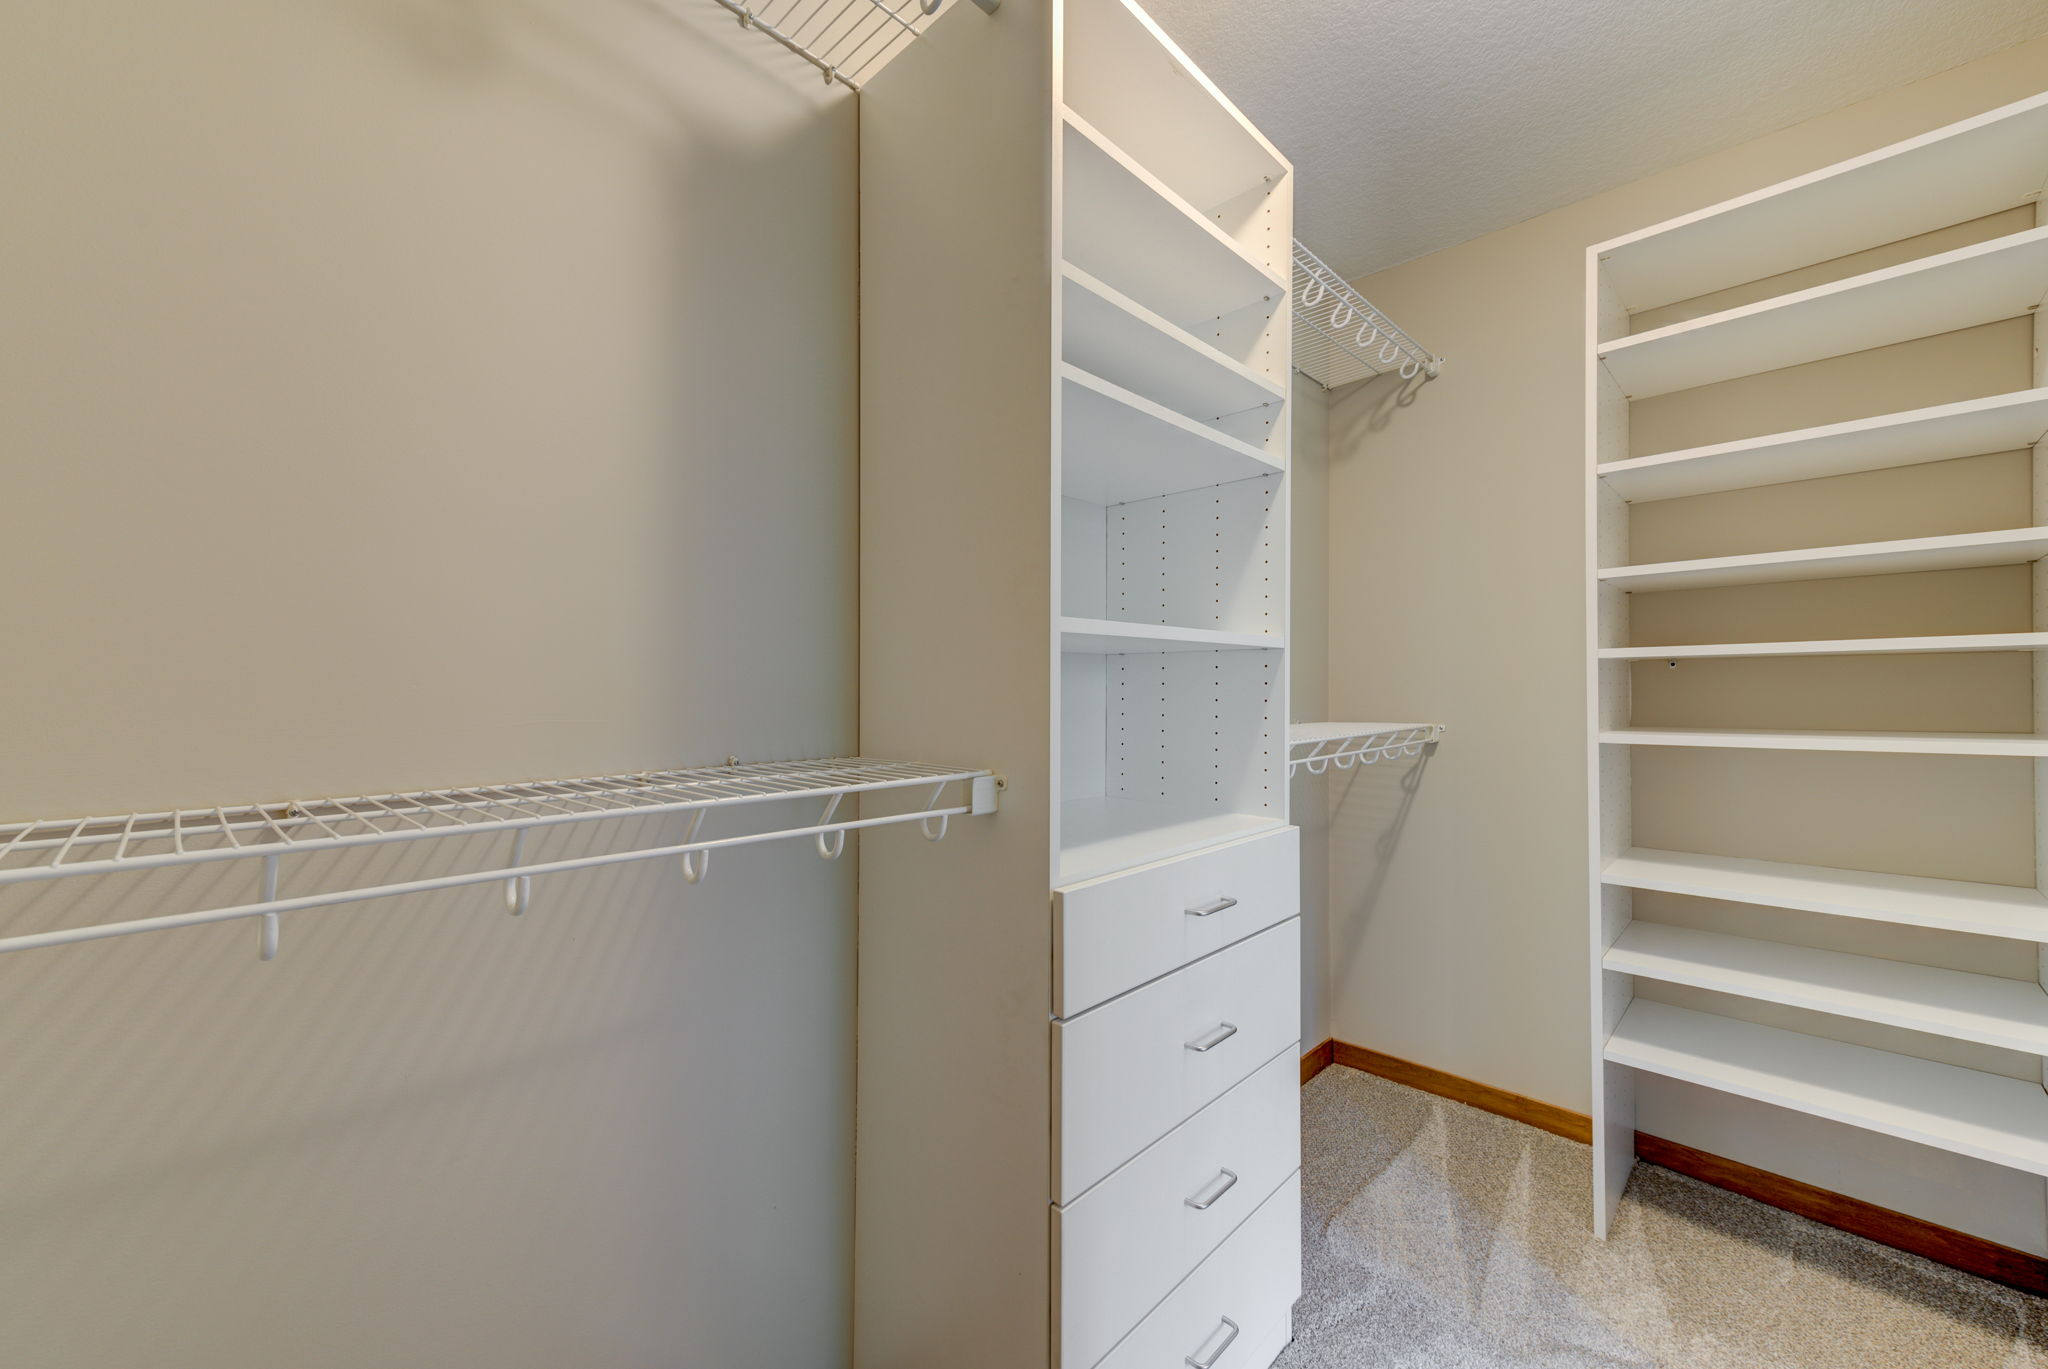 Bedroom 5 Closet